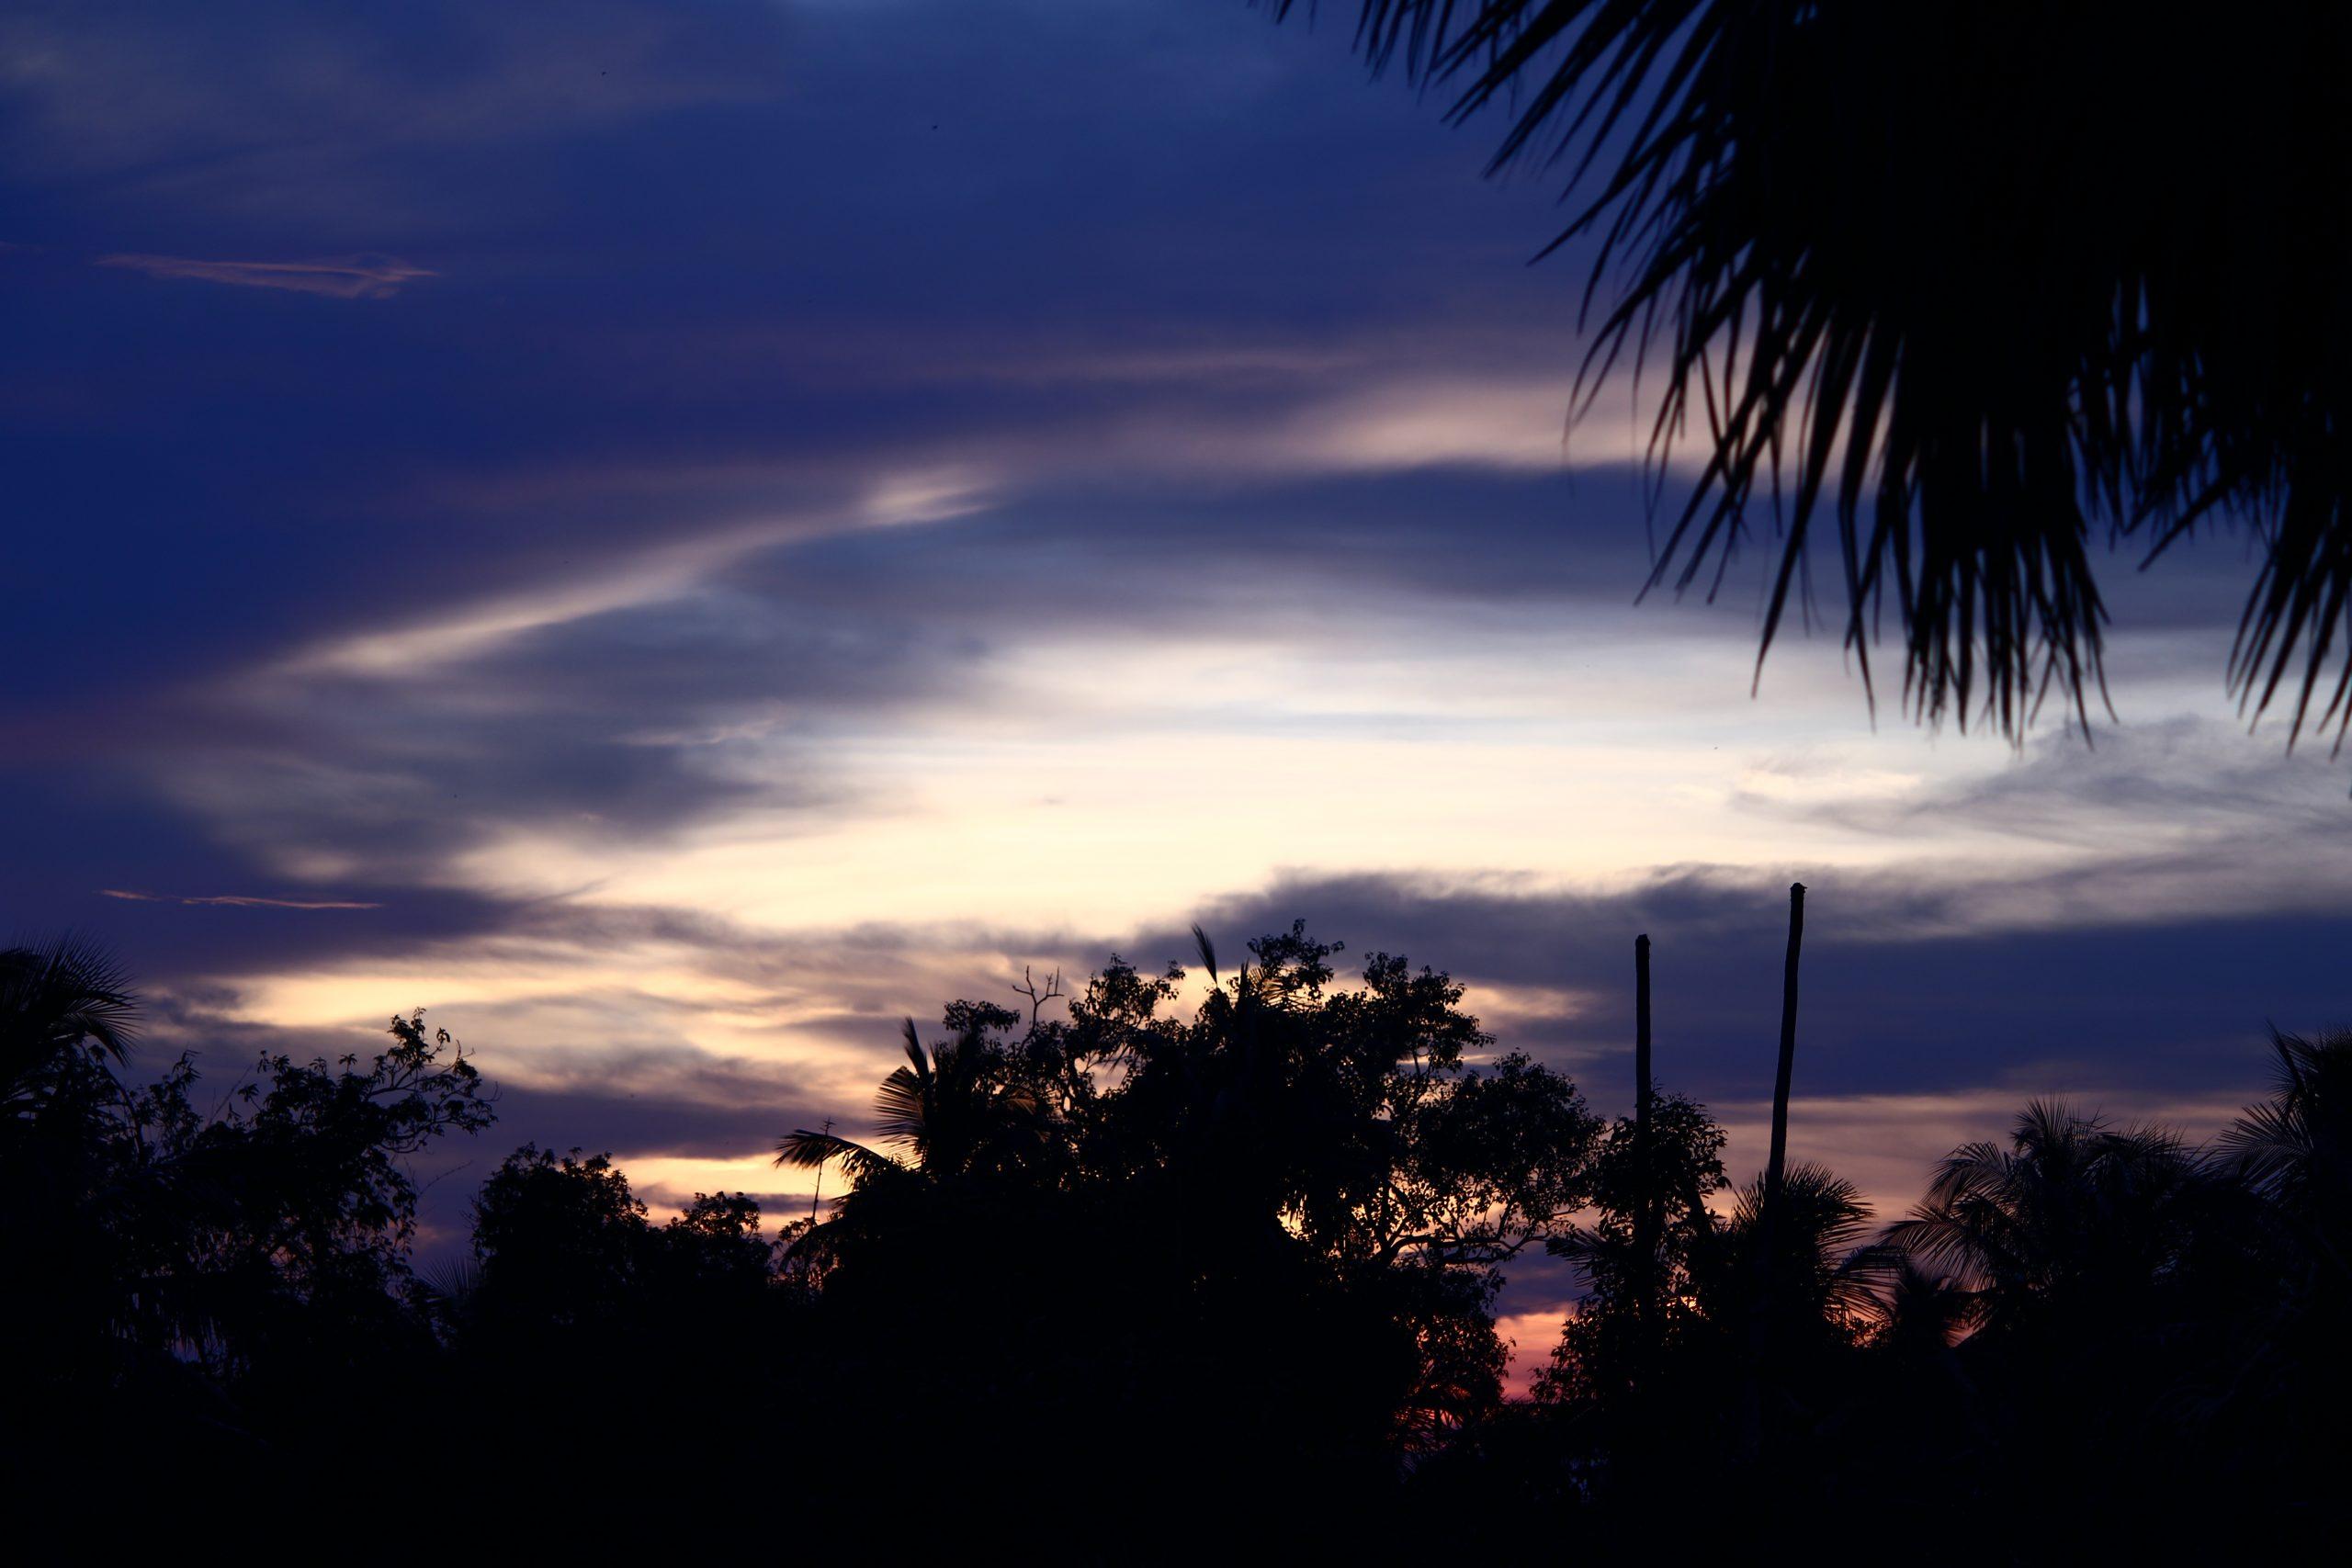 A Dawn Scenery